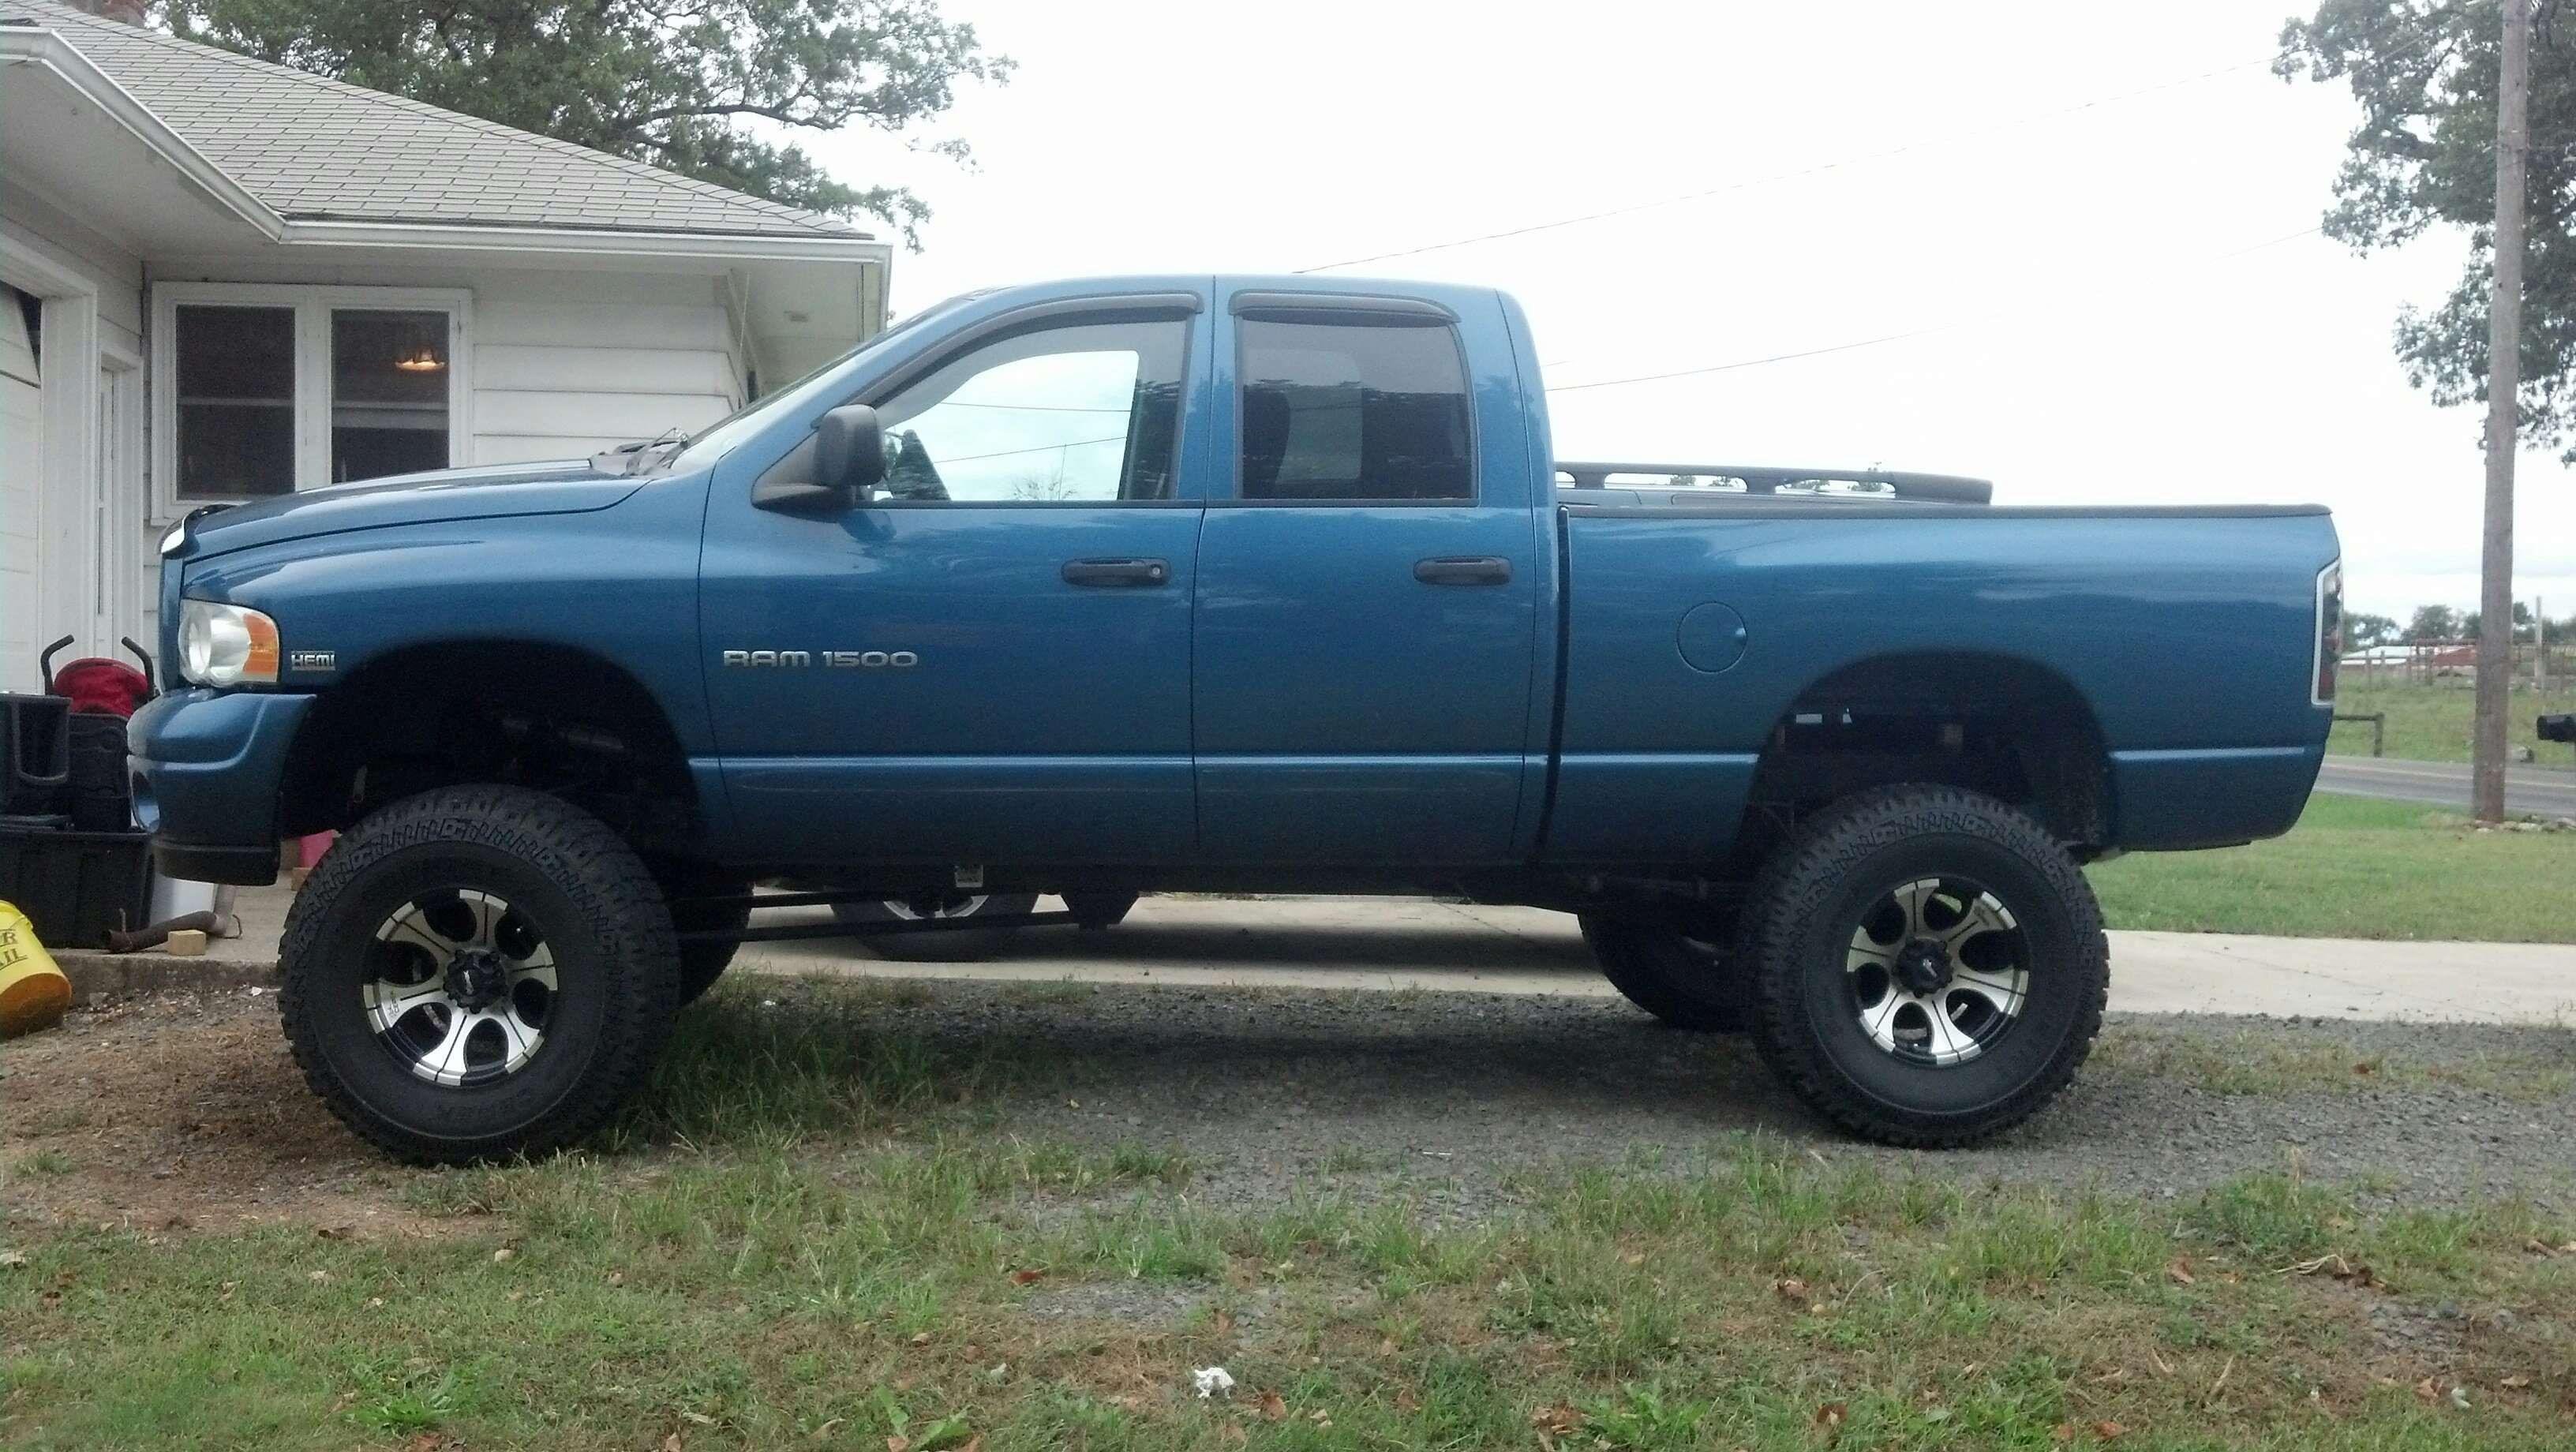 Make Dodge Model Ram 1500 Truck Year 2004 Exterior Color Blue Interior & Make: Dodge Model: Ram 1500 Truck Year: 2004 Exterior Color: Blue ... pezcame.com